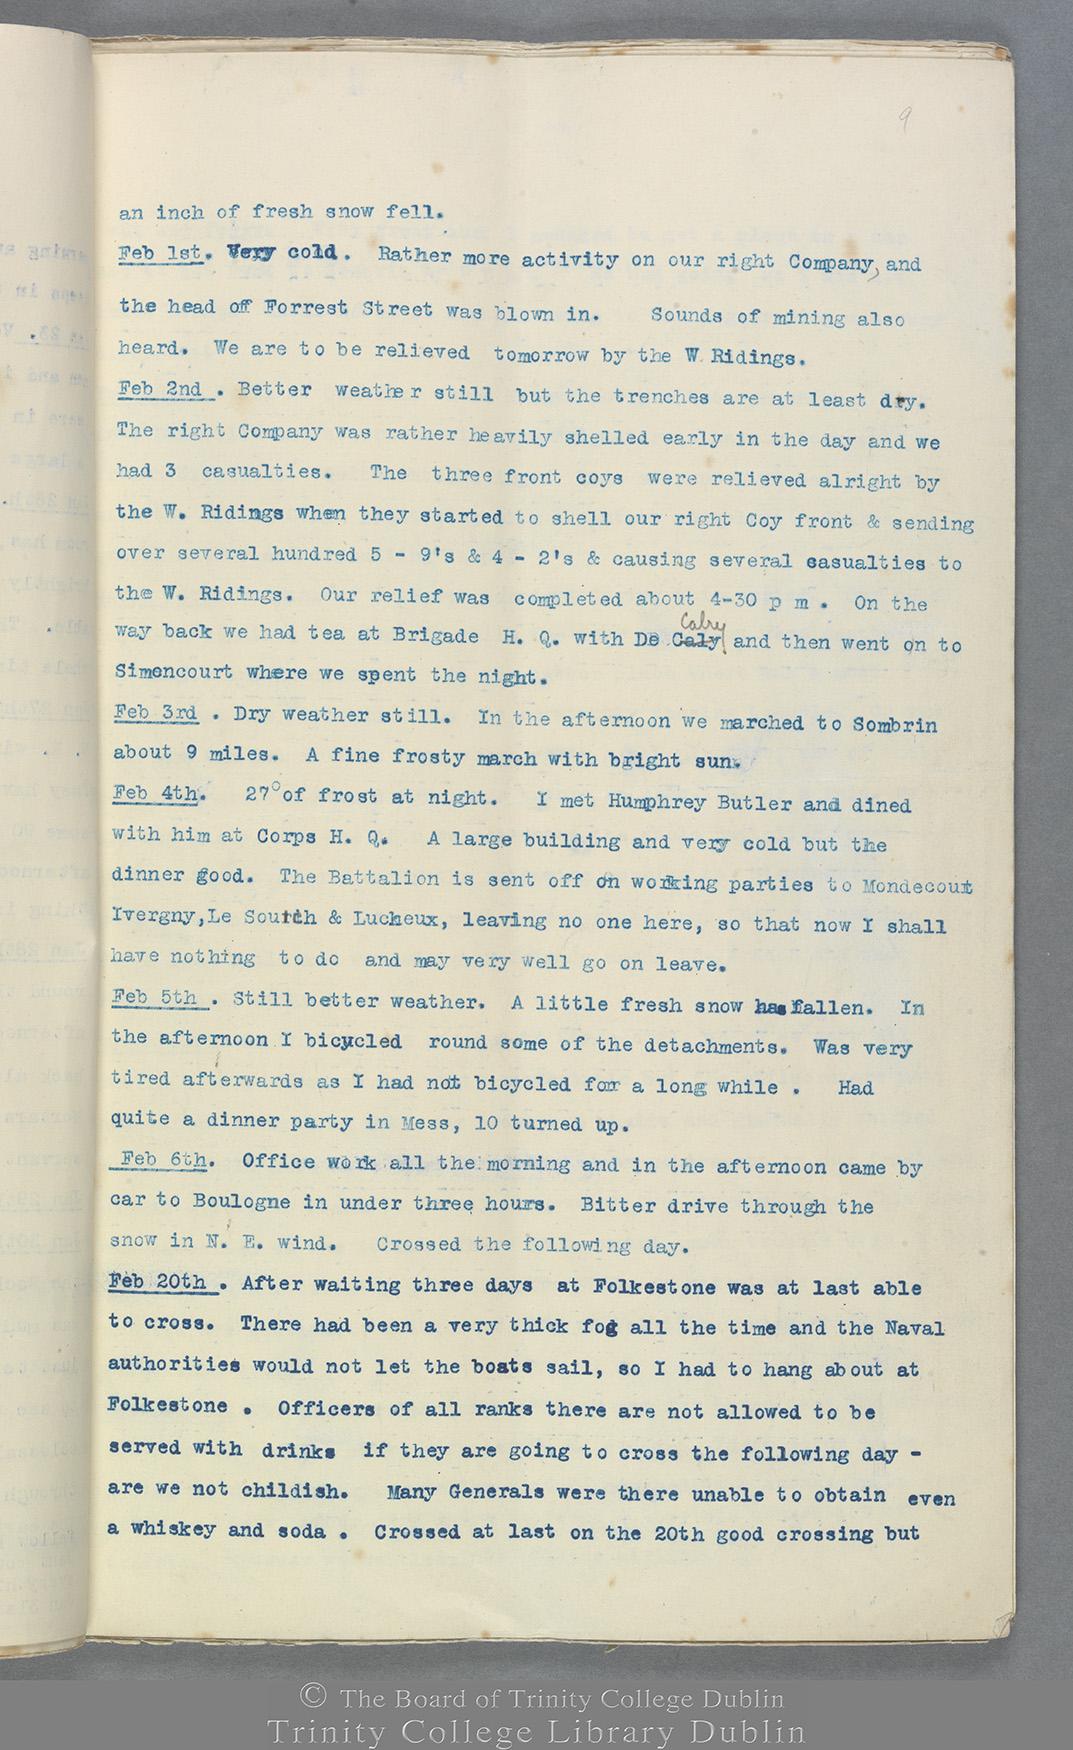 TCD MS 10822 folio 9 recto